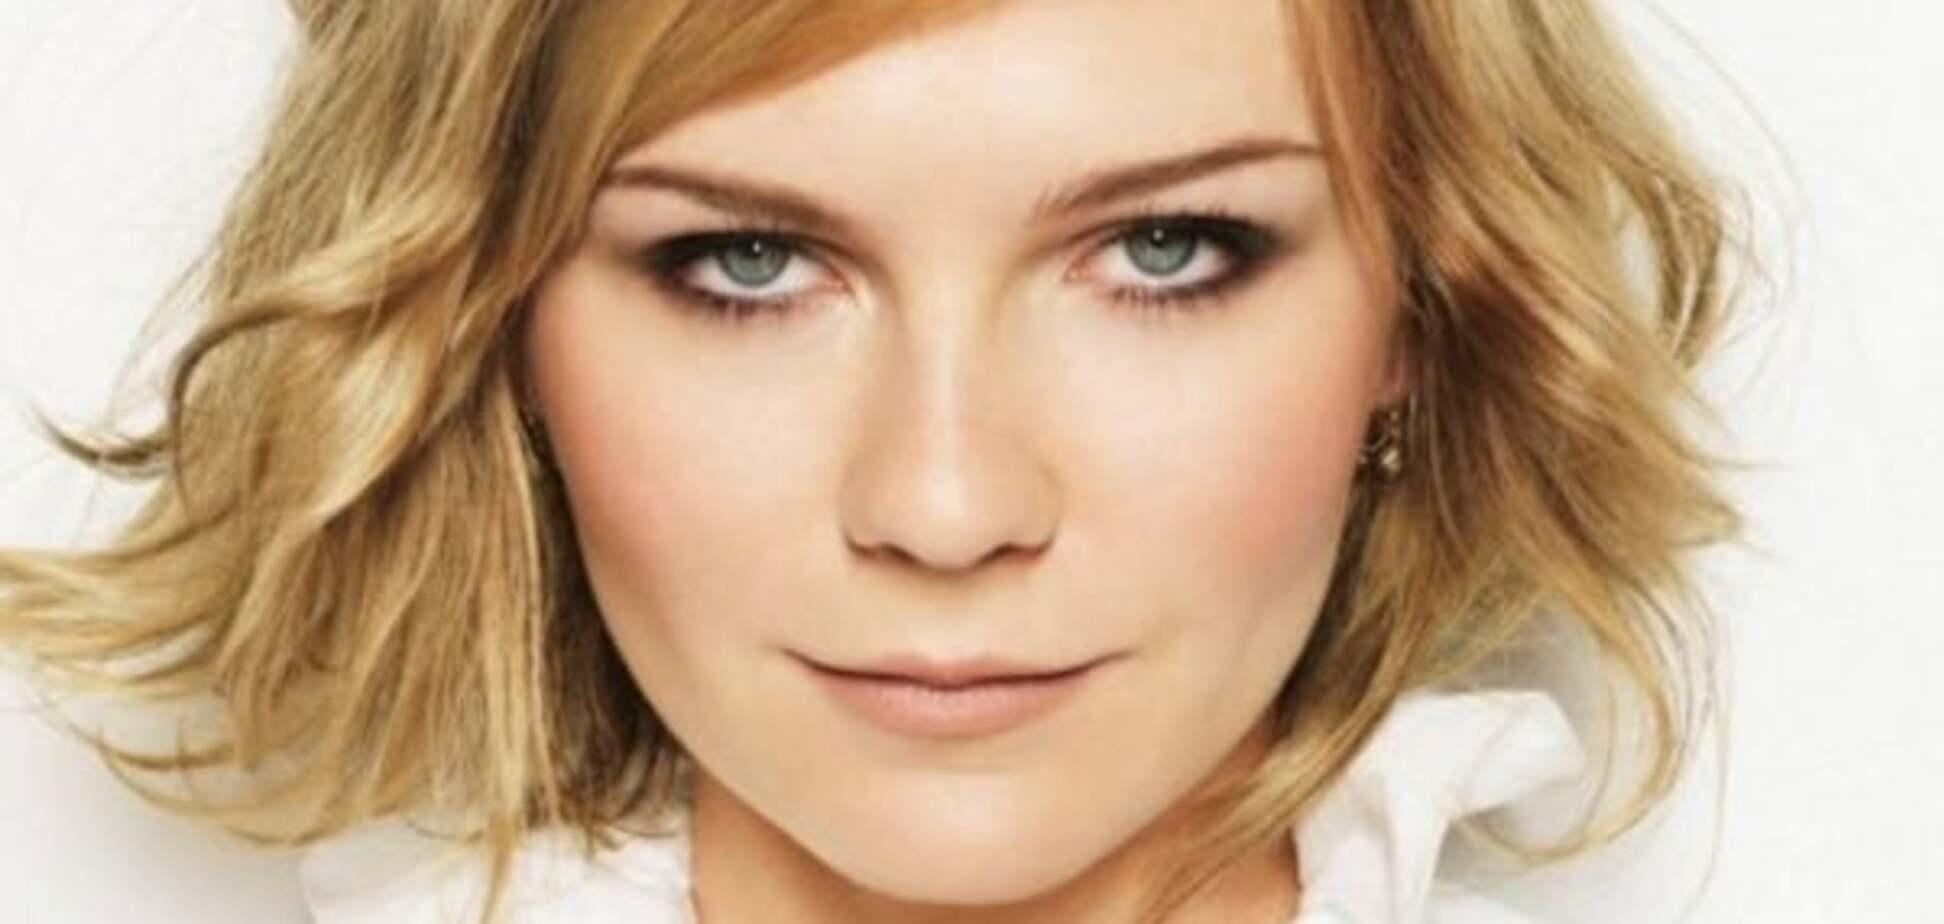 33-летняя Кирстен Данст выйдет замуж за звезду фильма 'Троя'